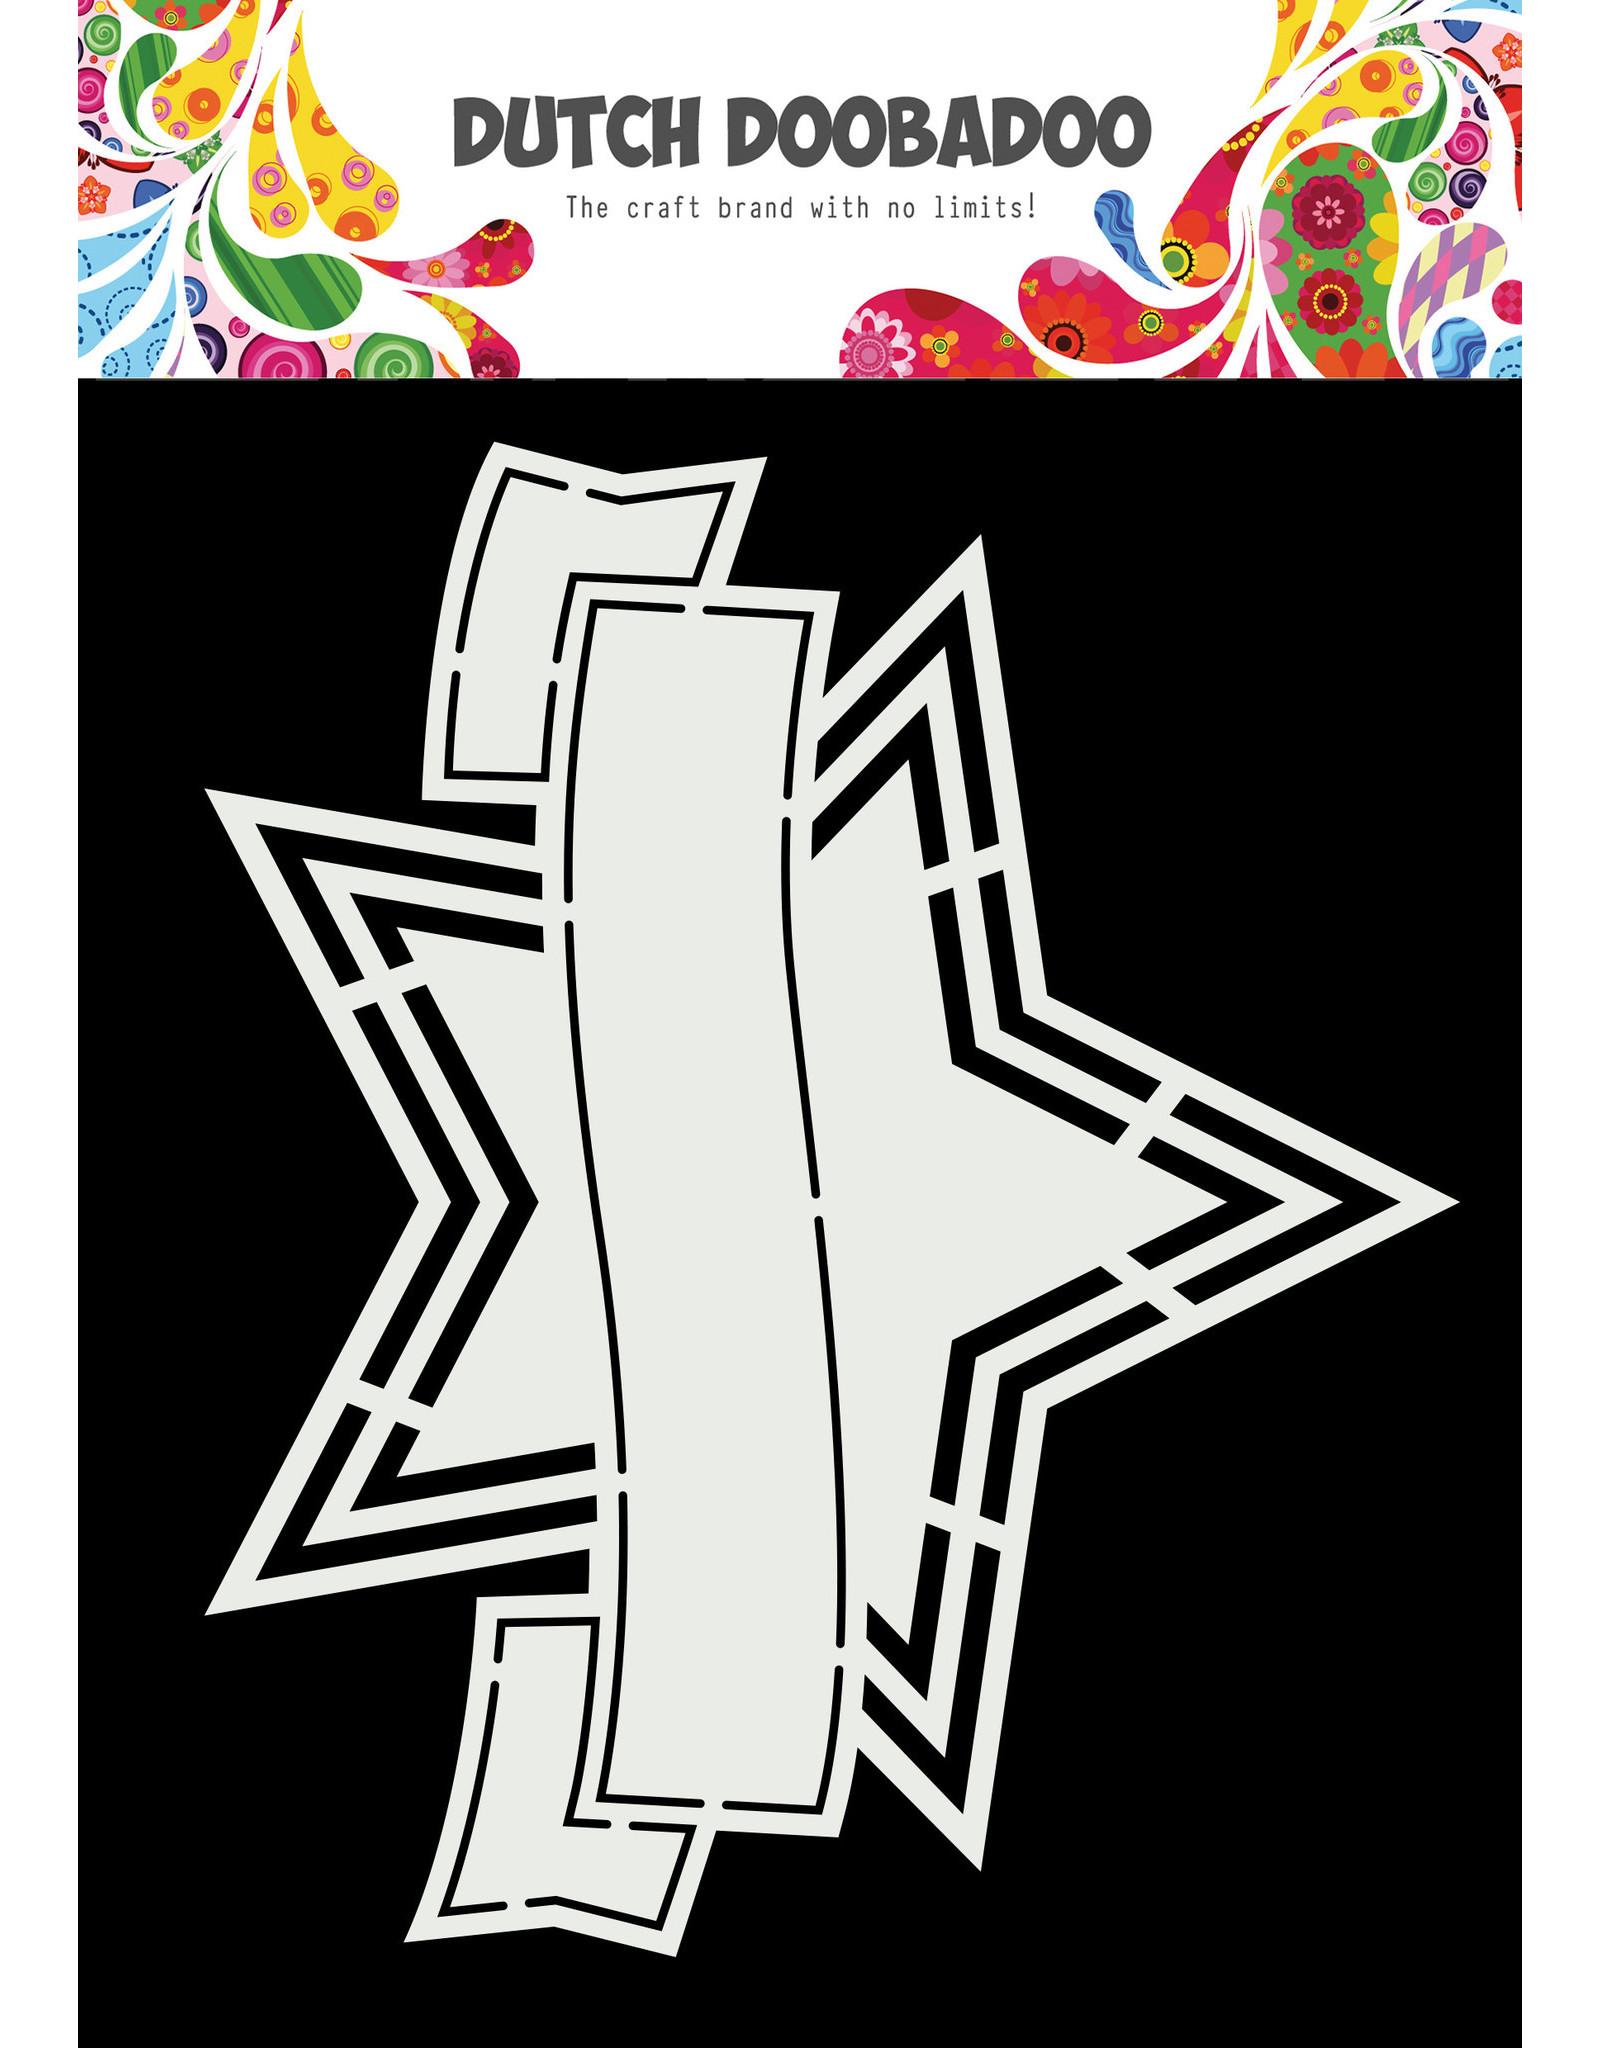 Dutch Doobadoo DDBD Shape Art Star banner